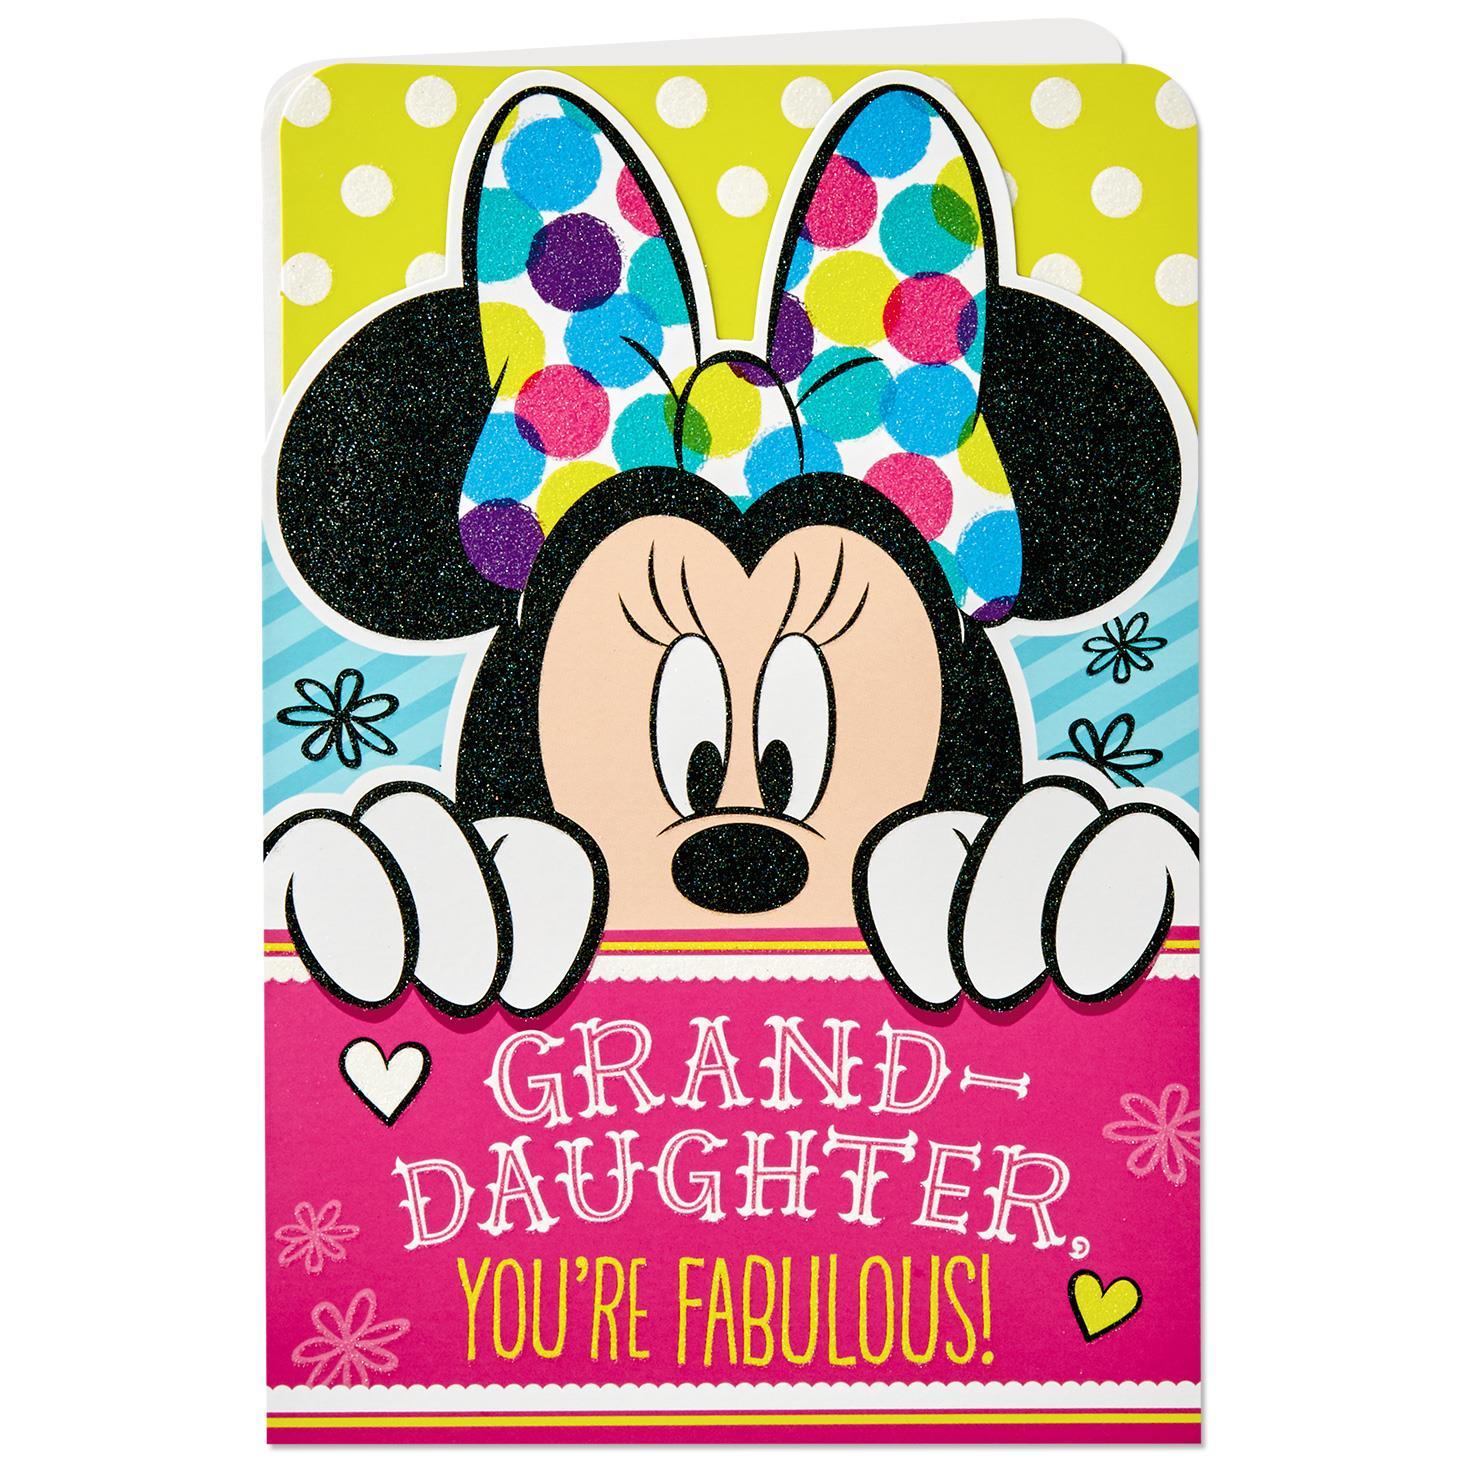 Minnie Mouse Musical 1st Birthday Card: Disney Minnie Mouse Birthday Card For Granddaughter With